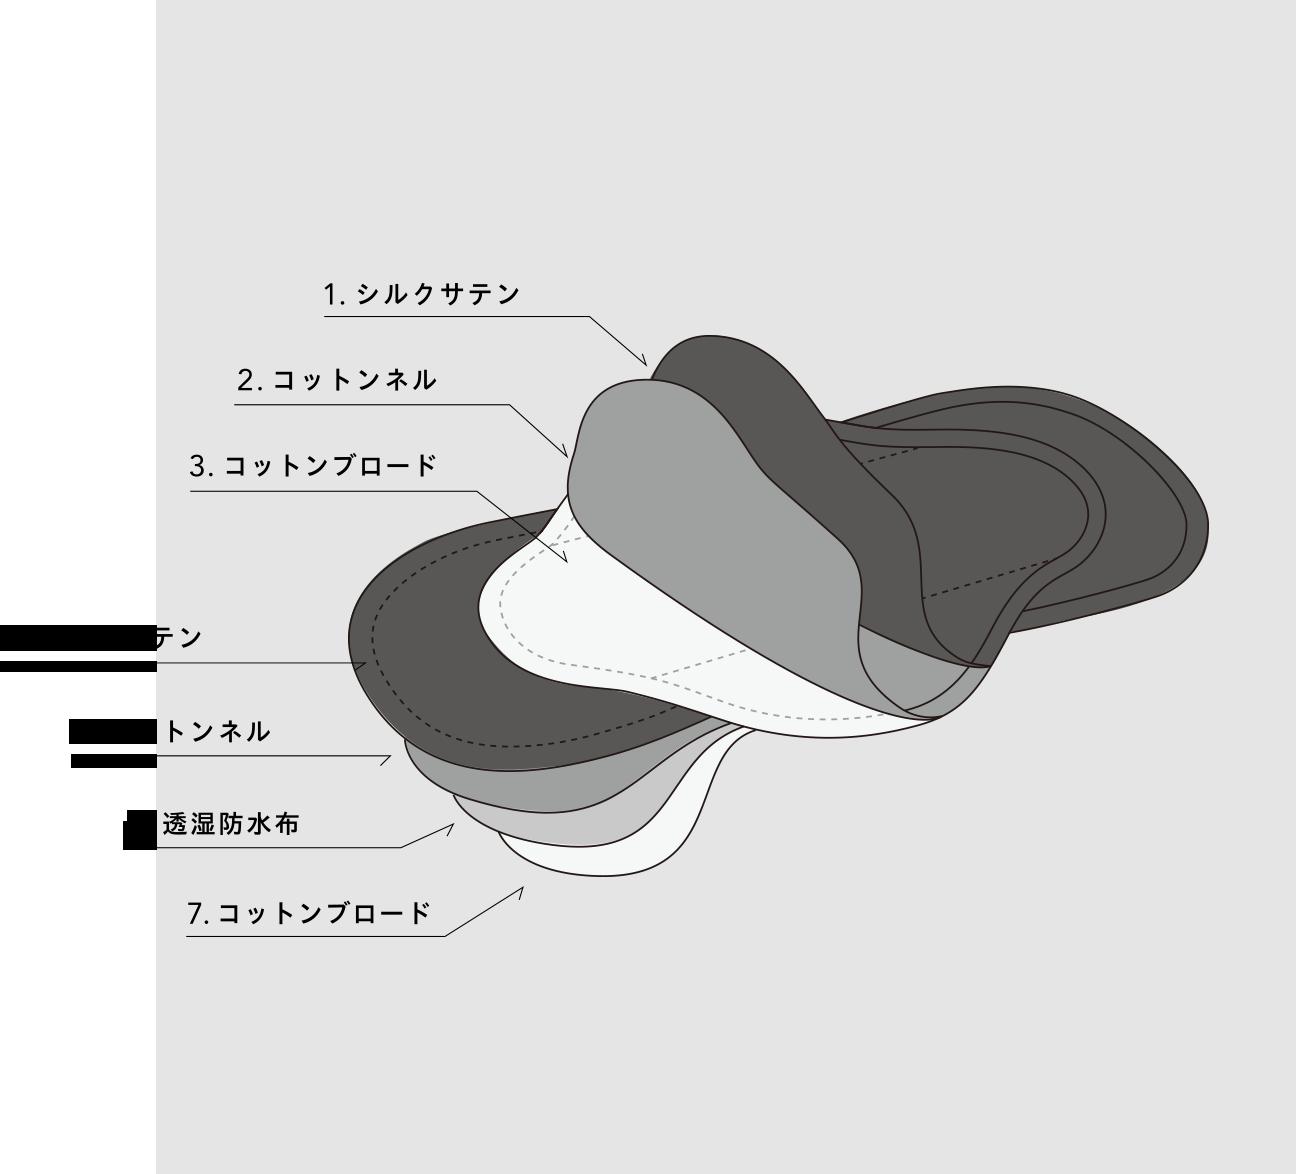 Be-A Japan/ベア ジャパン 超吸収型生理ショーツ ベア シルクナプキンの内部構造